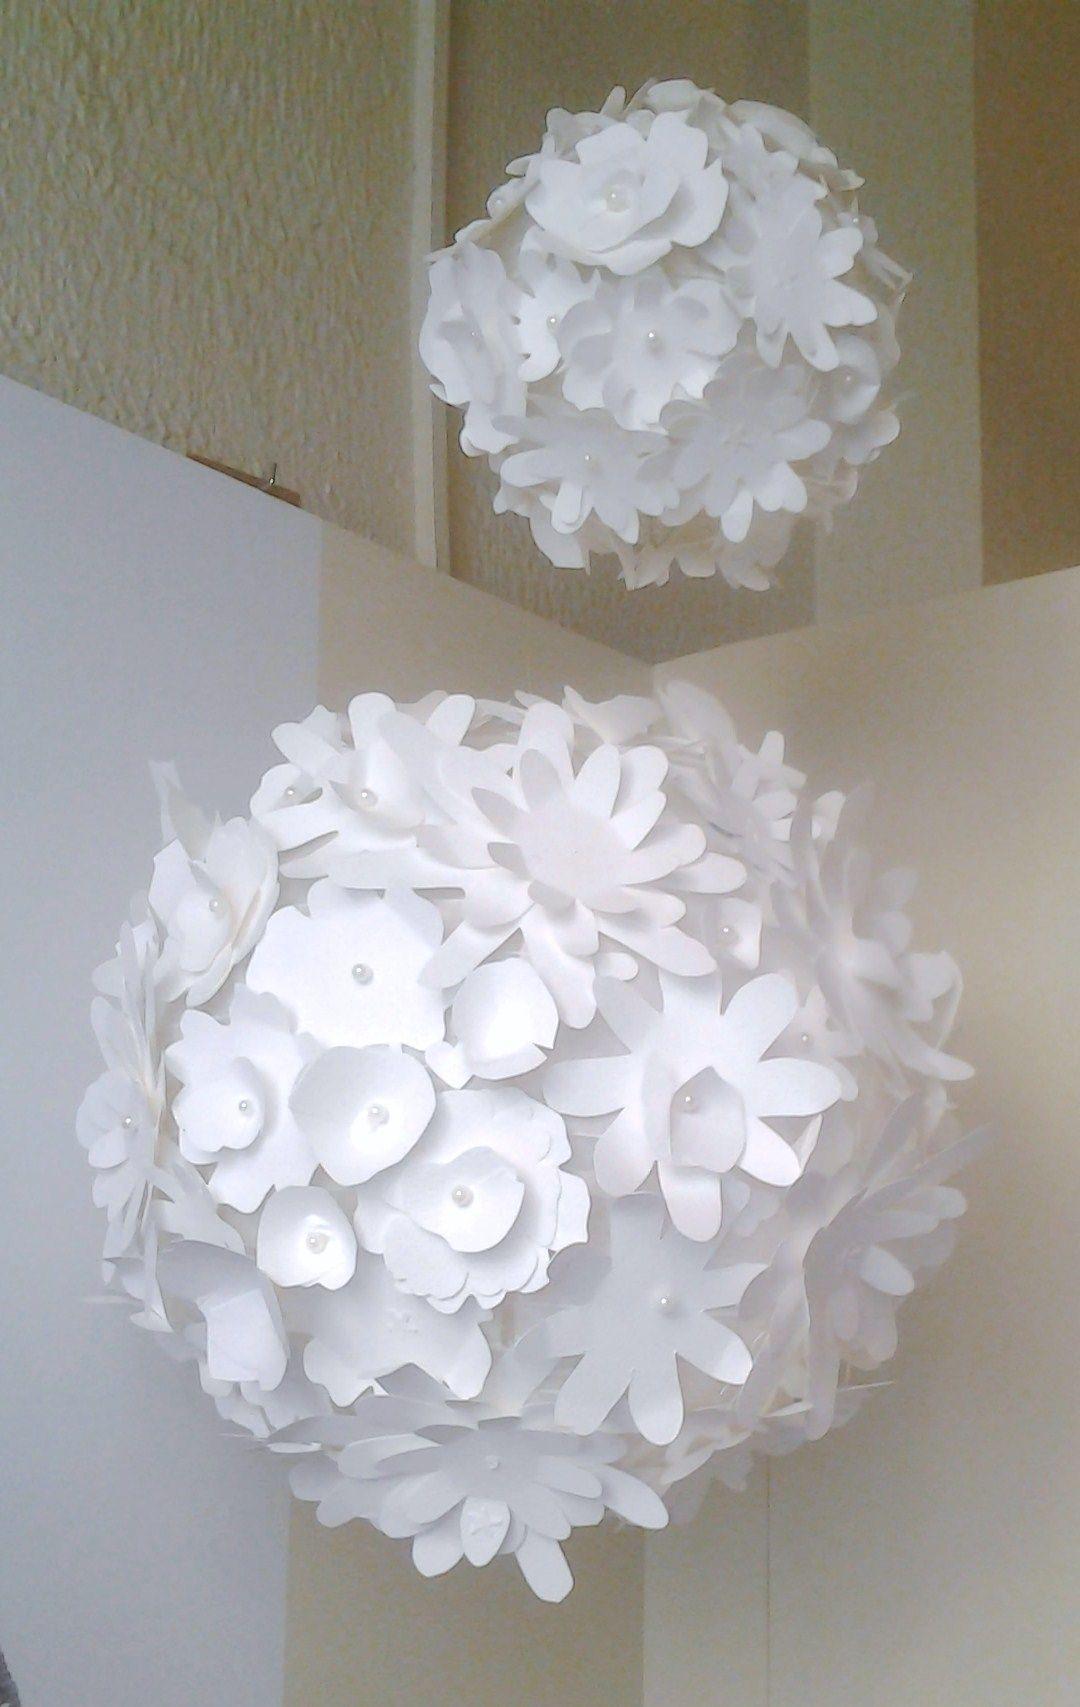 Lamparas de papel monisimas cosas de papel pinterest - Lamparas de techo de papel ...